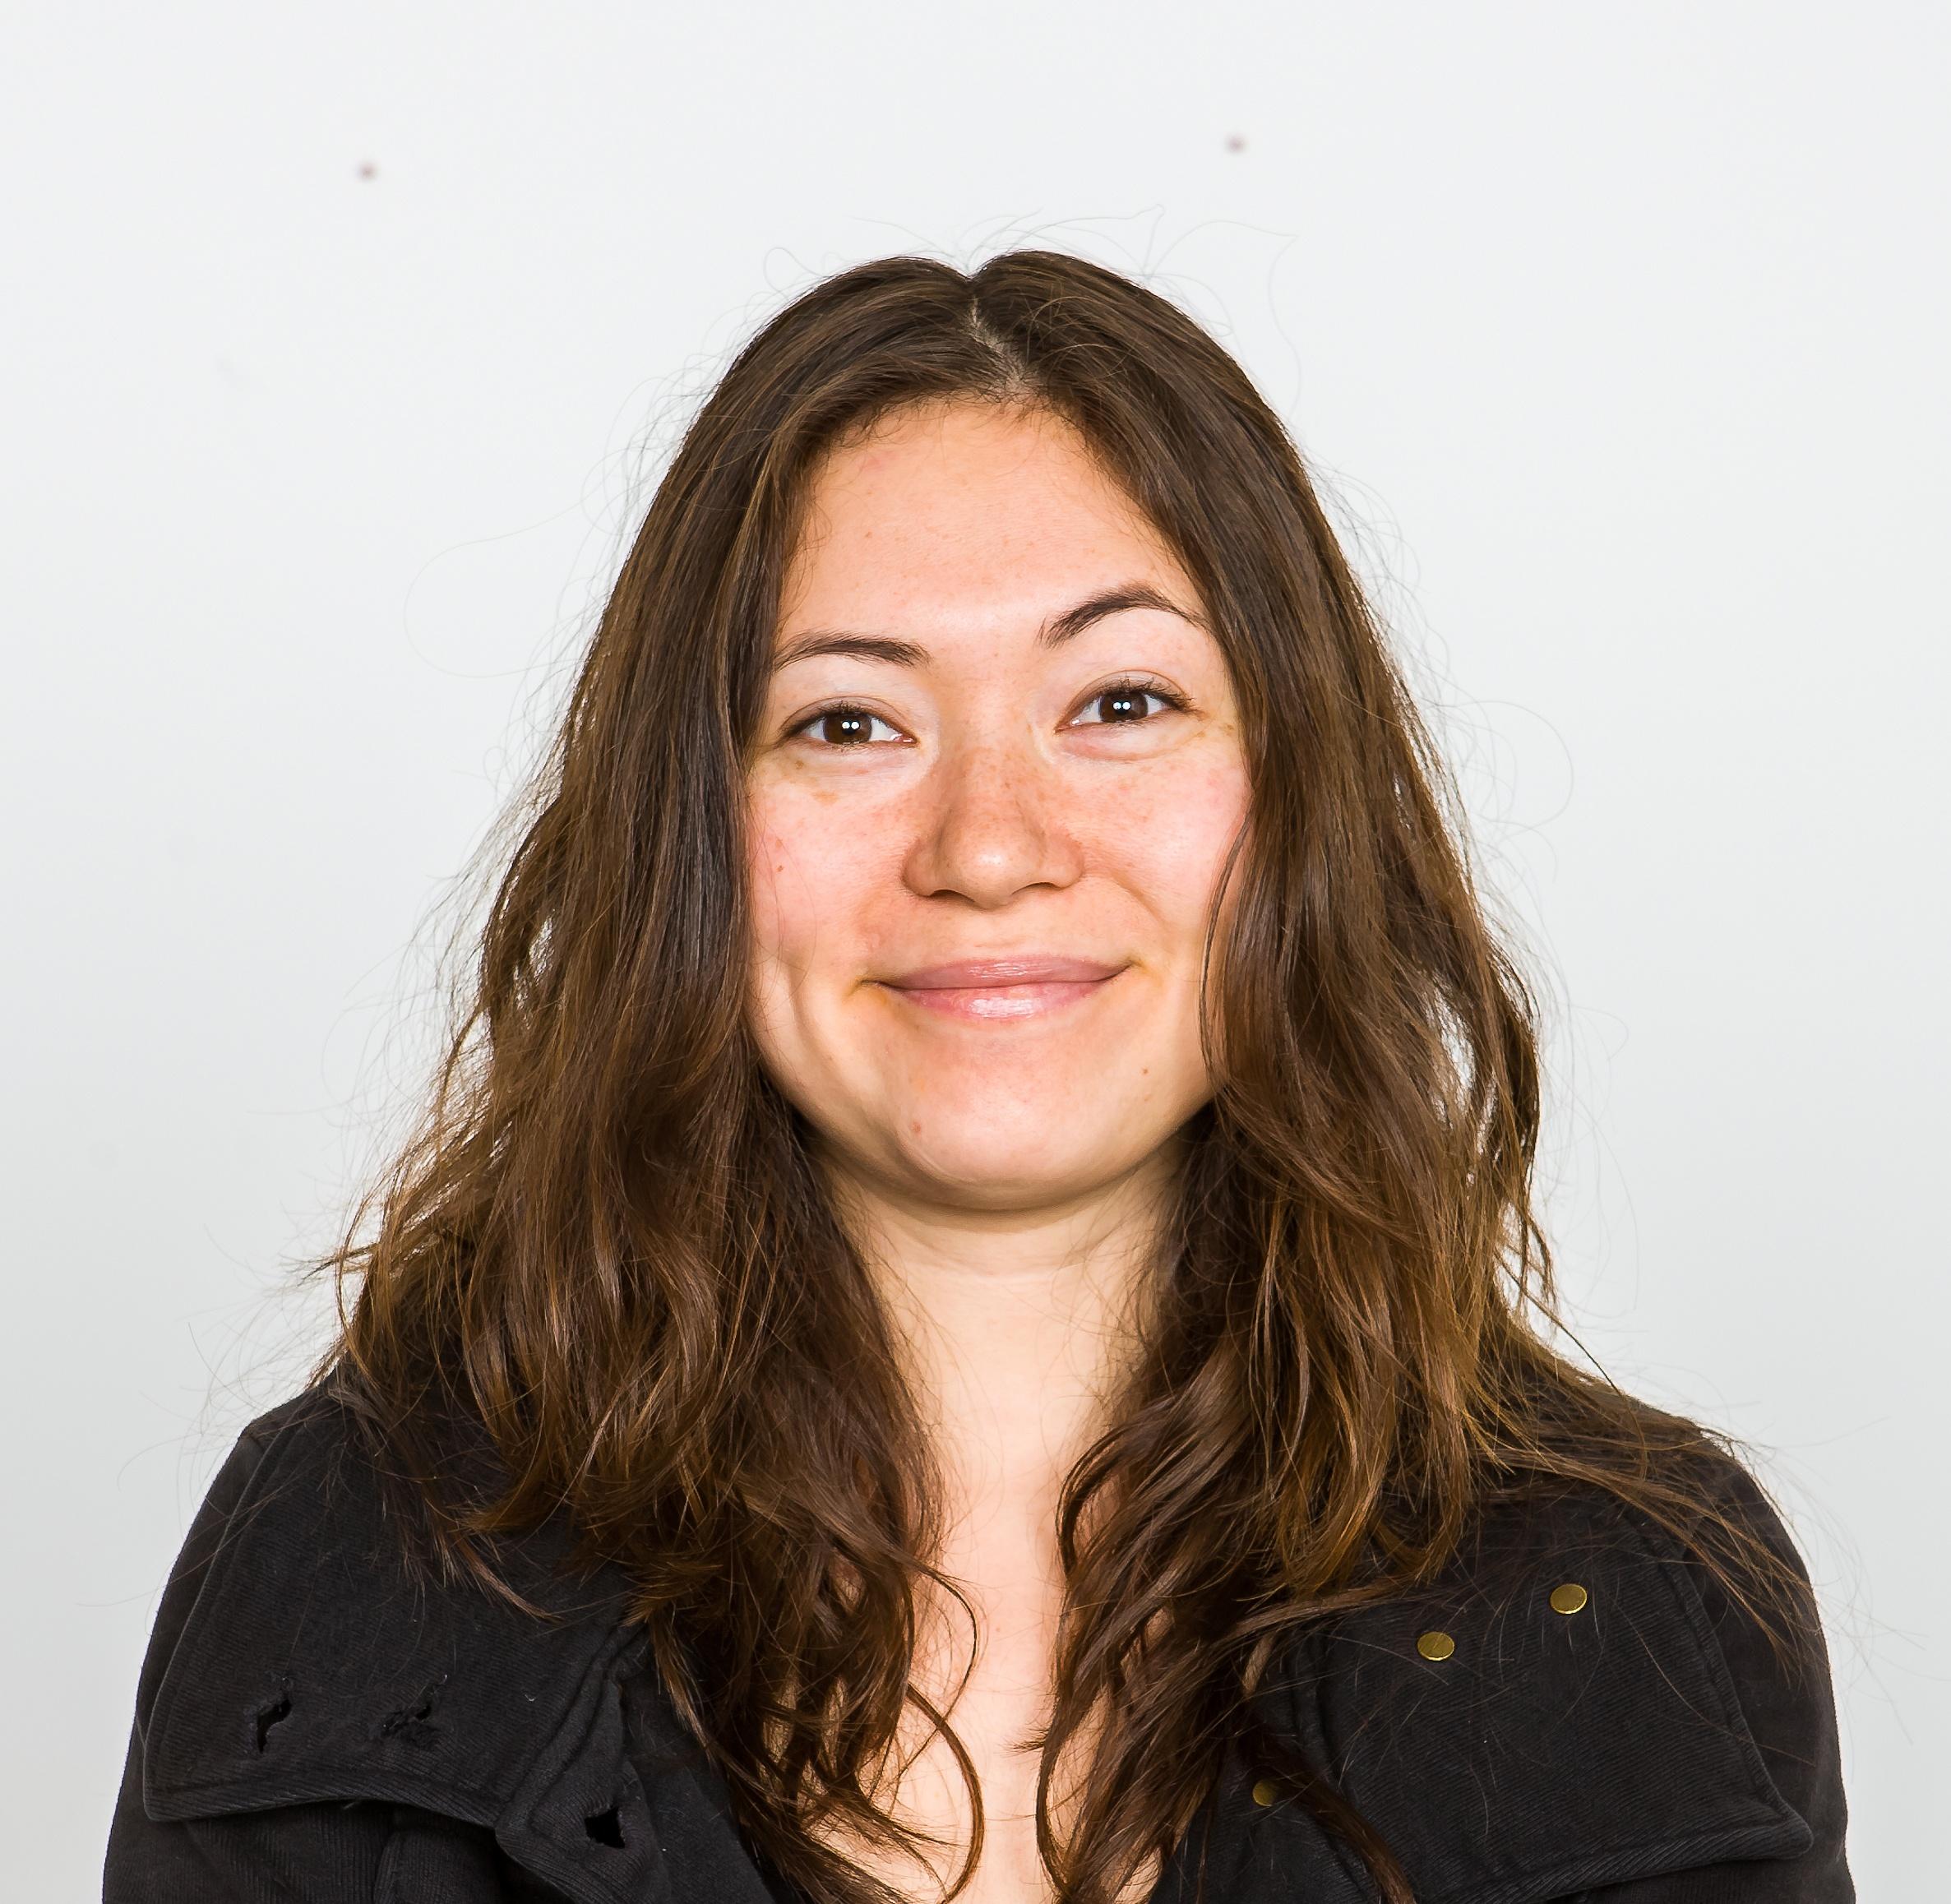 Angela Kaczmarczyk